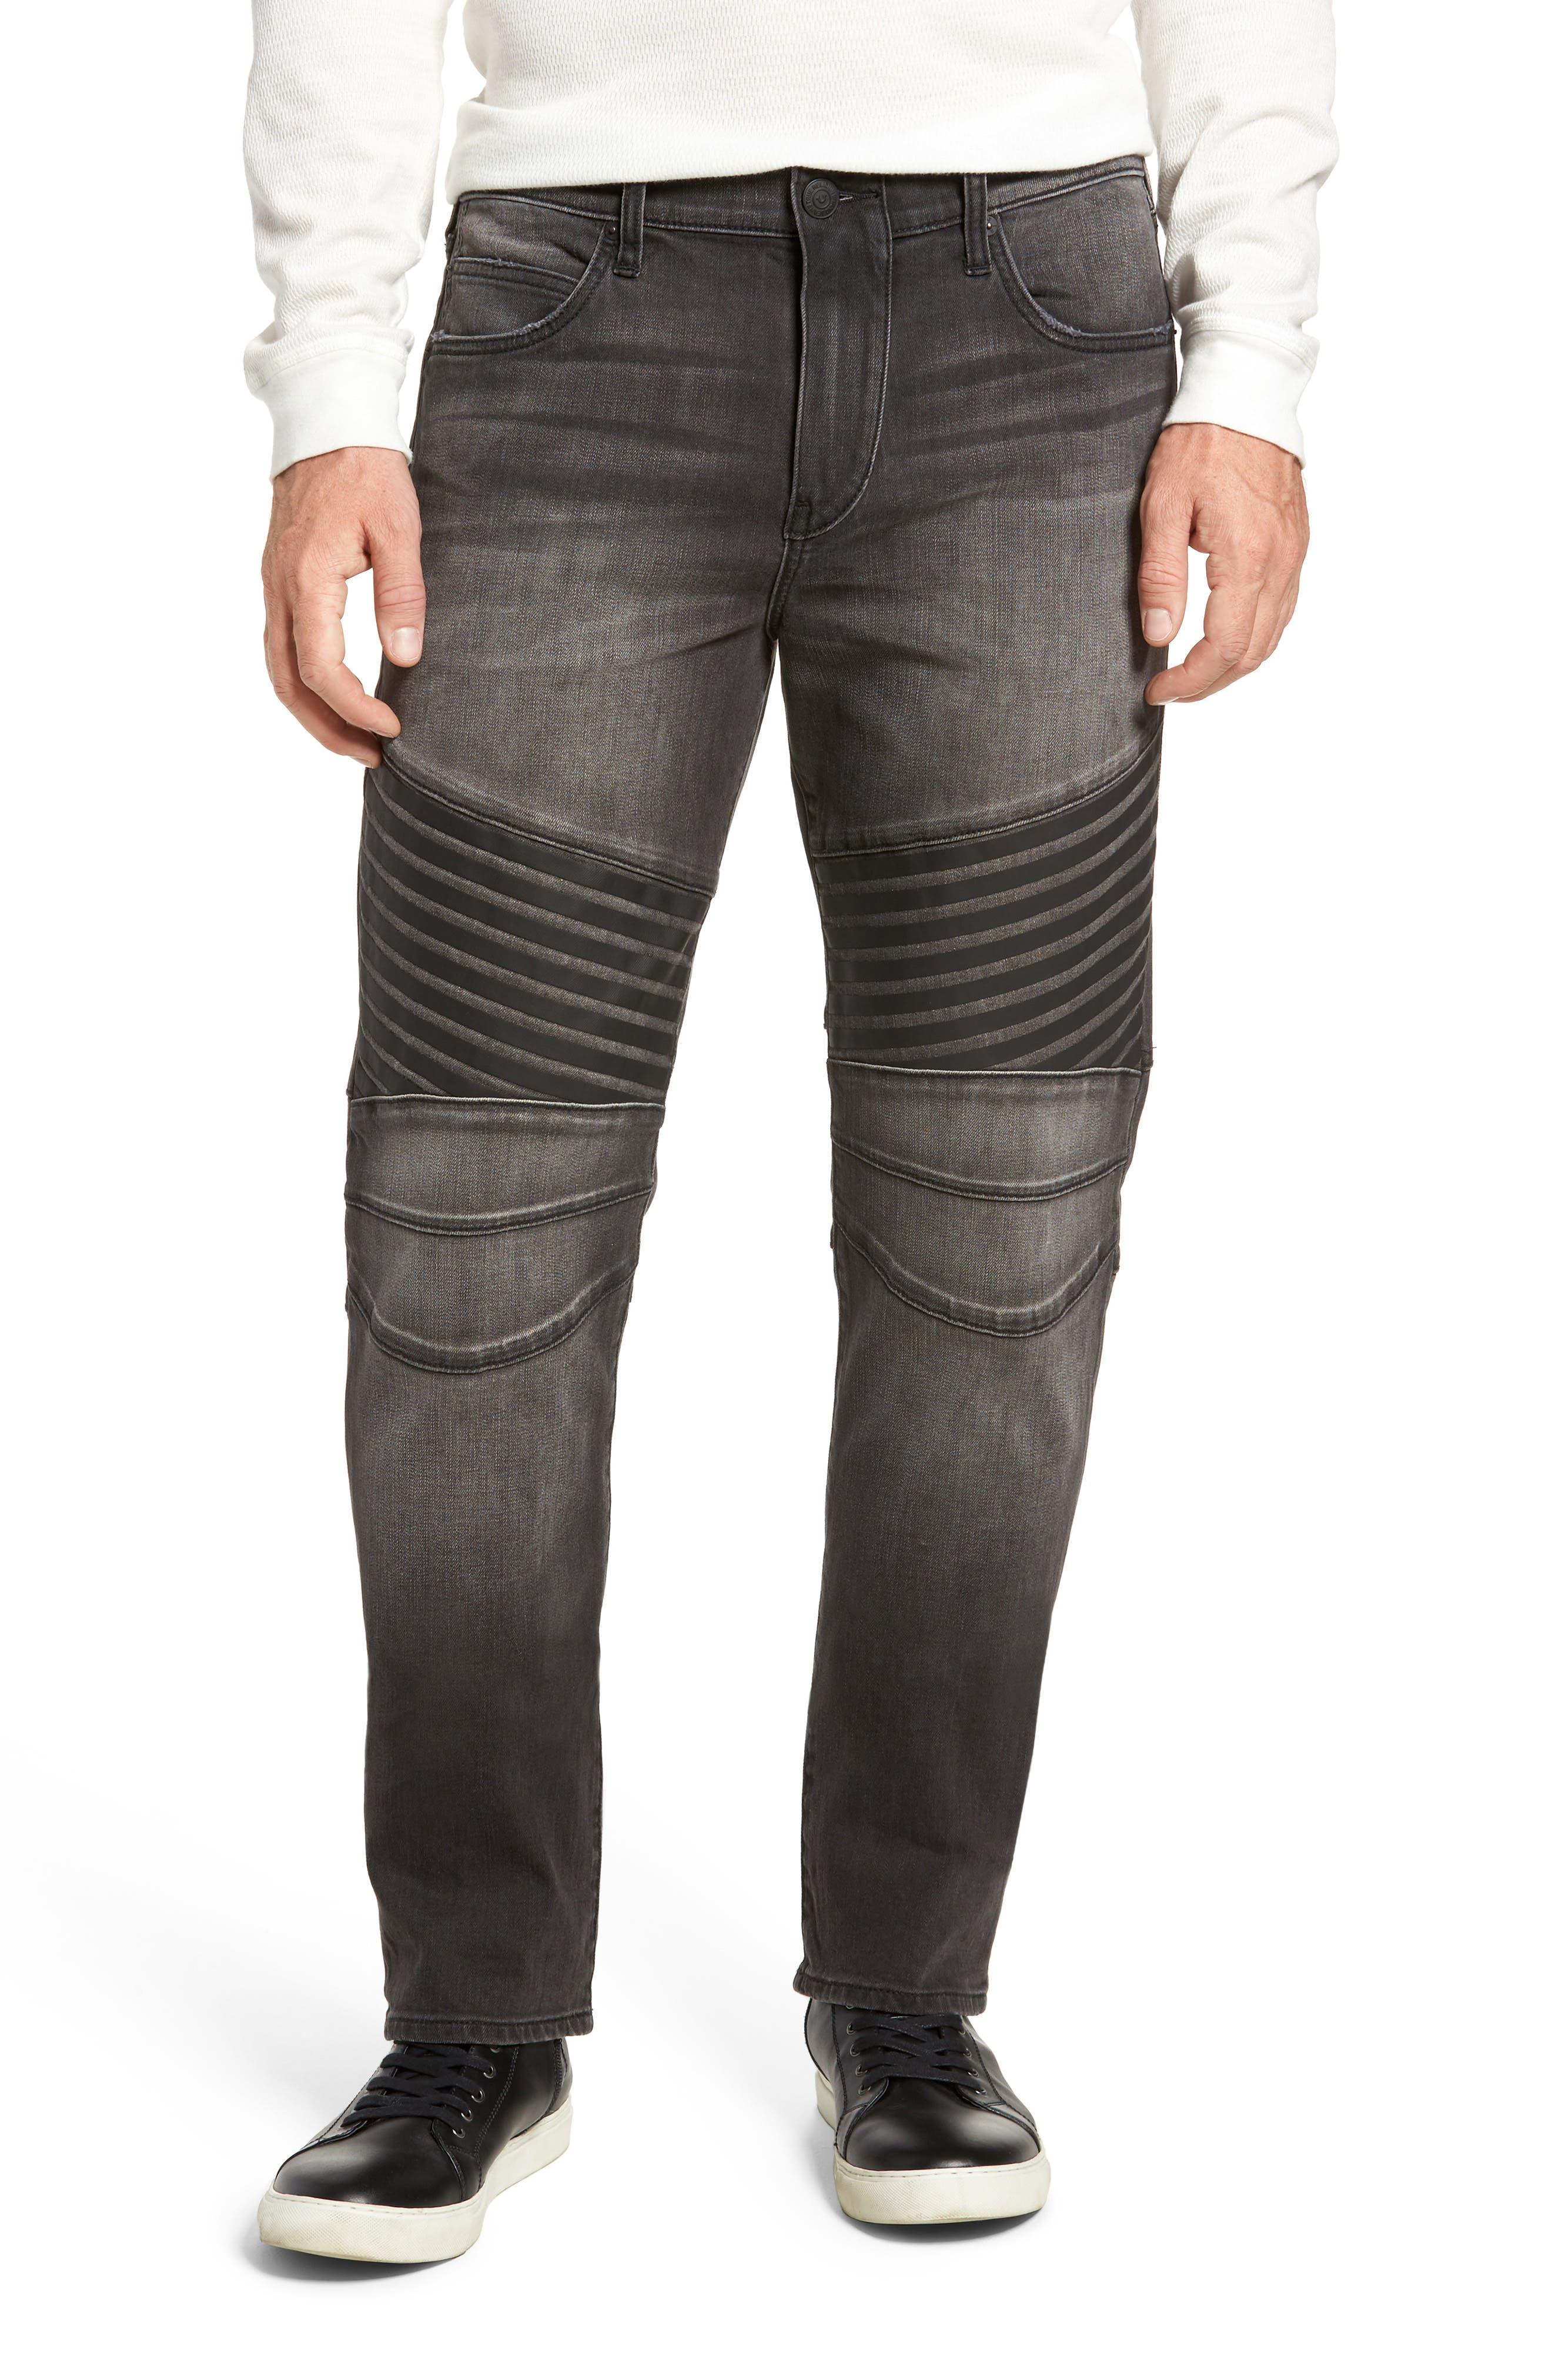 Geno Straight Leg Jeans,                         Main,                         color, DARK REBEL RACE